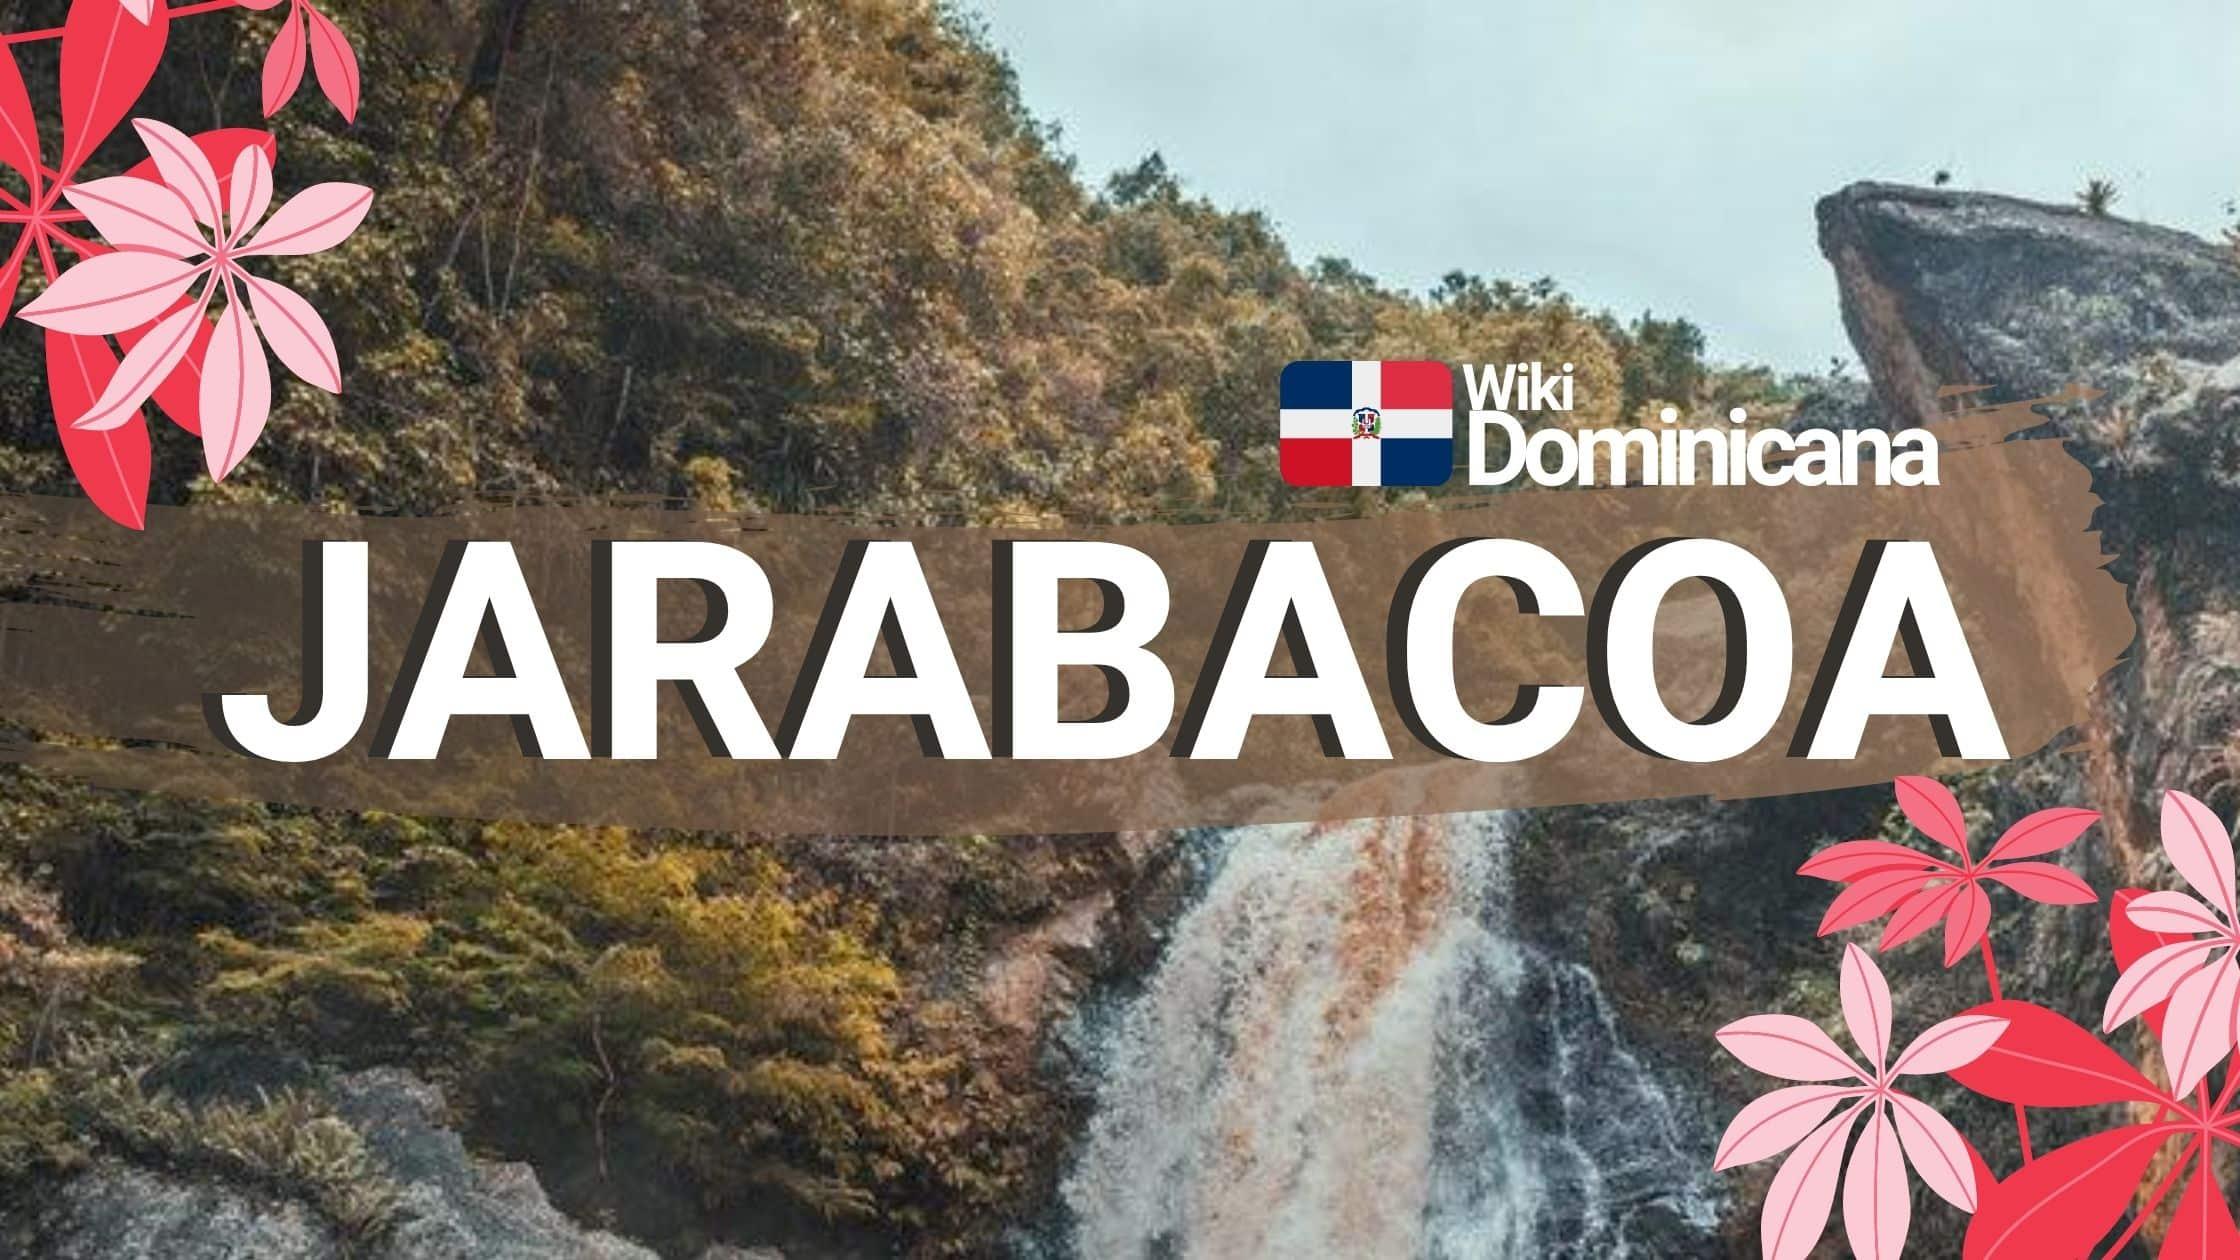 Jarabacoa